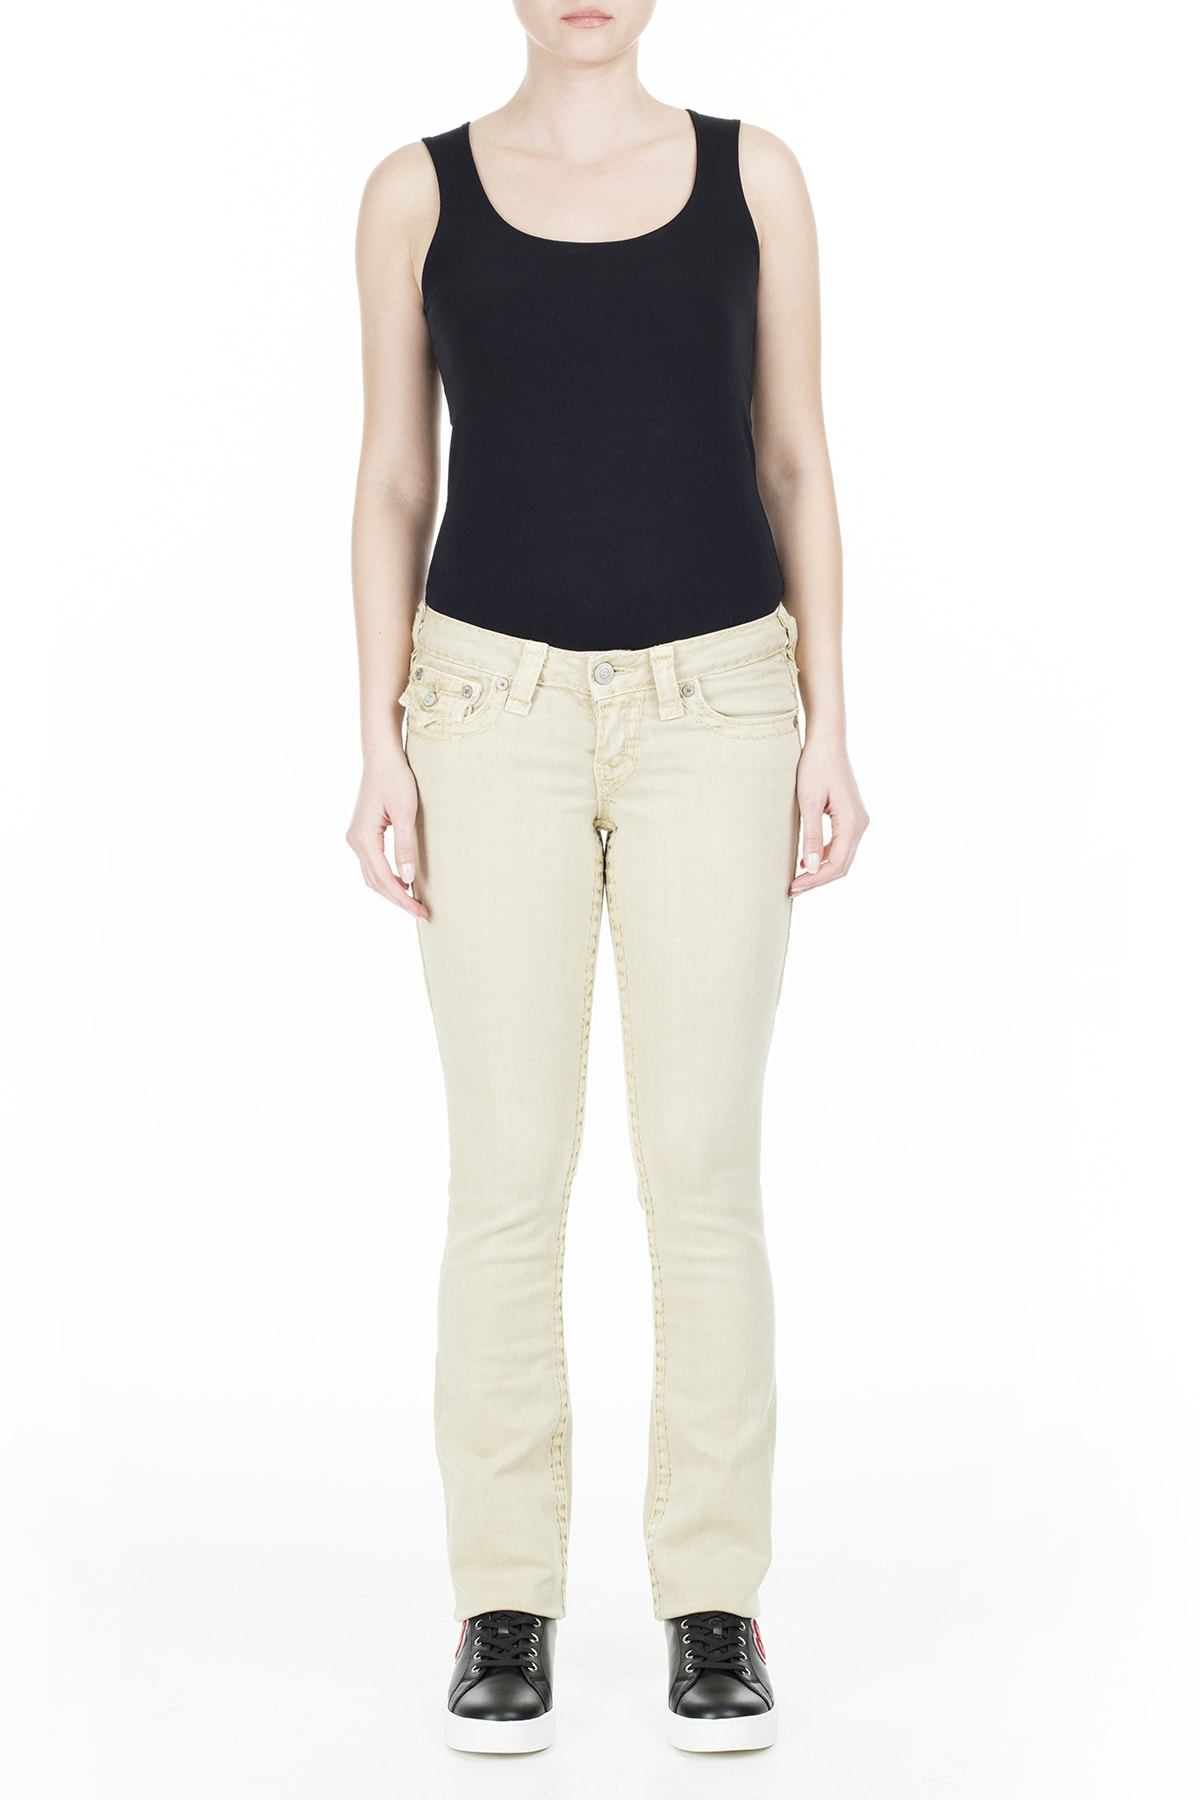 True Religion Jeans Kadın Kot Pantolon W95572N99 1